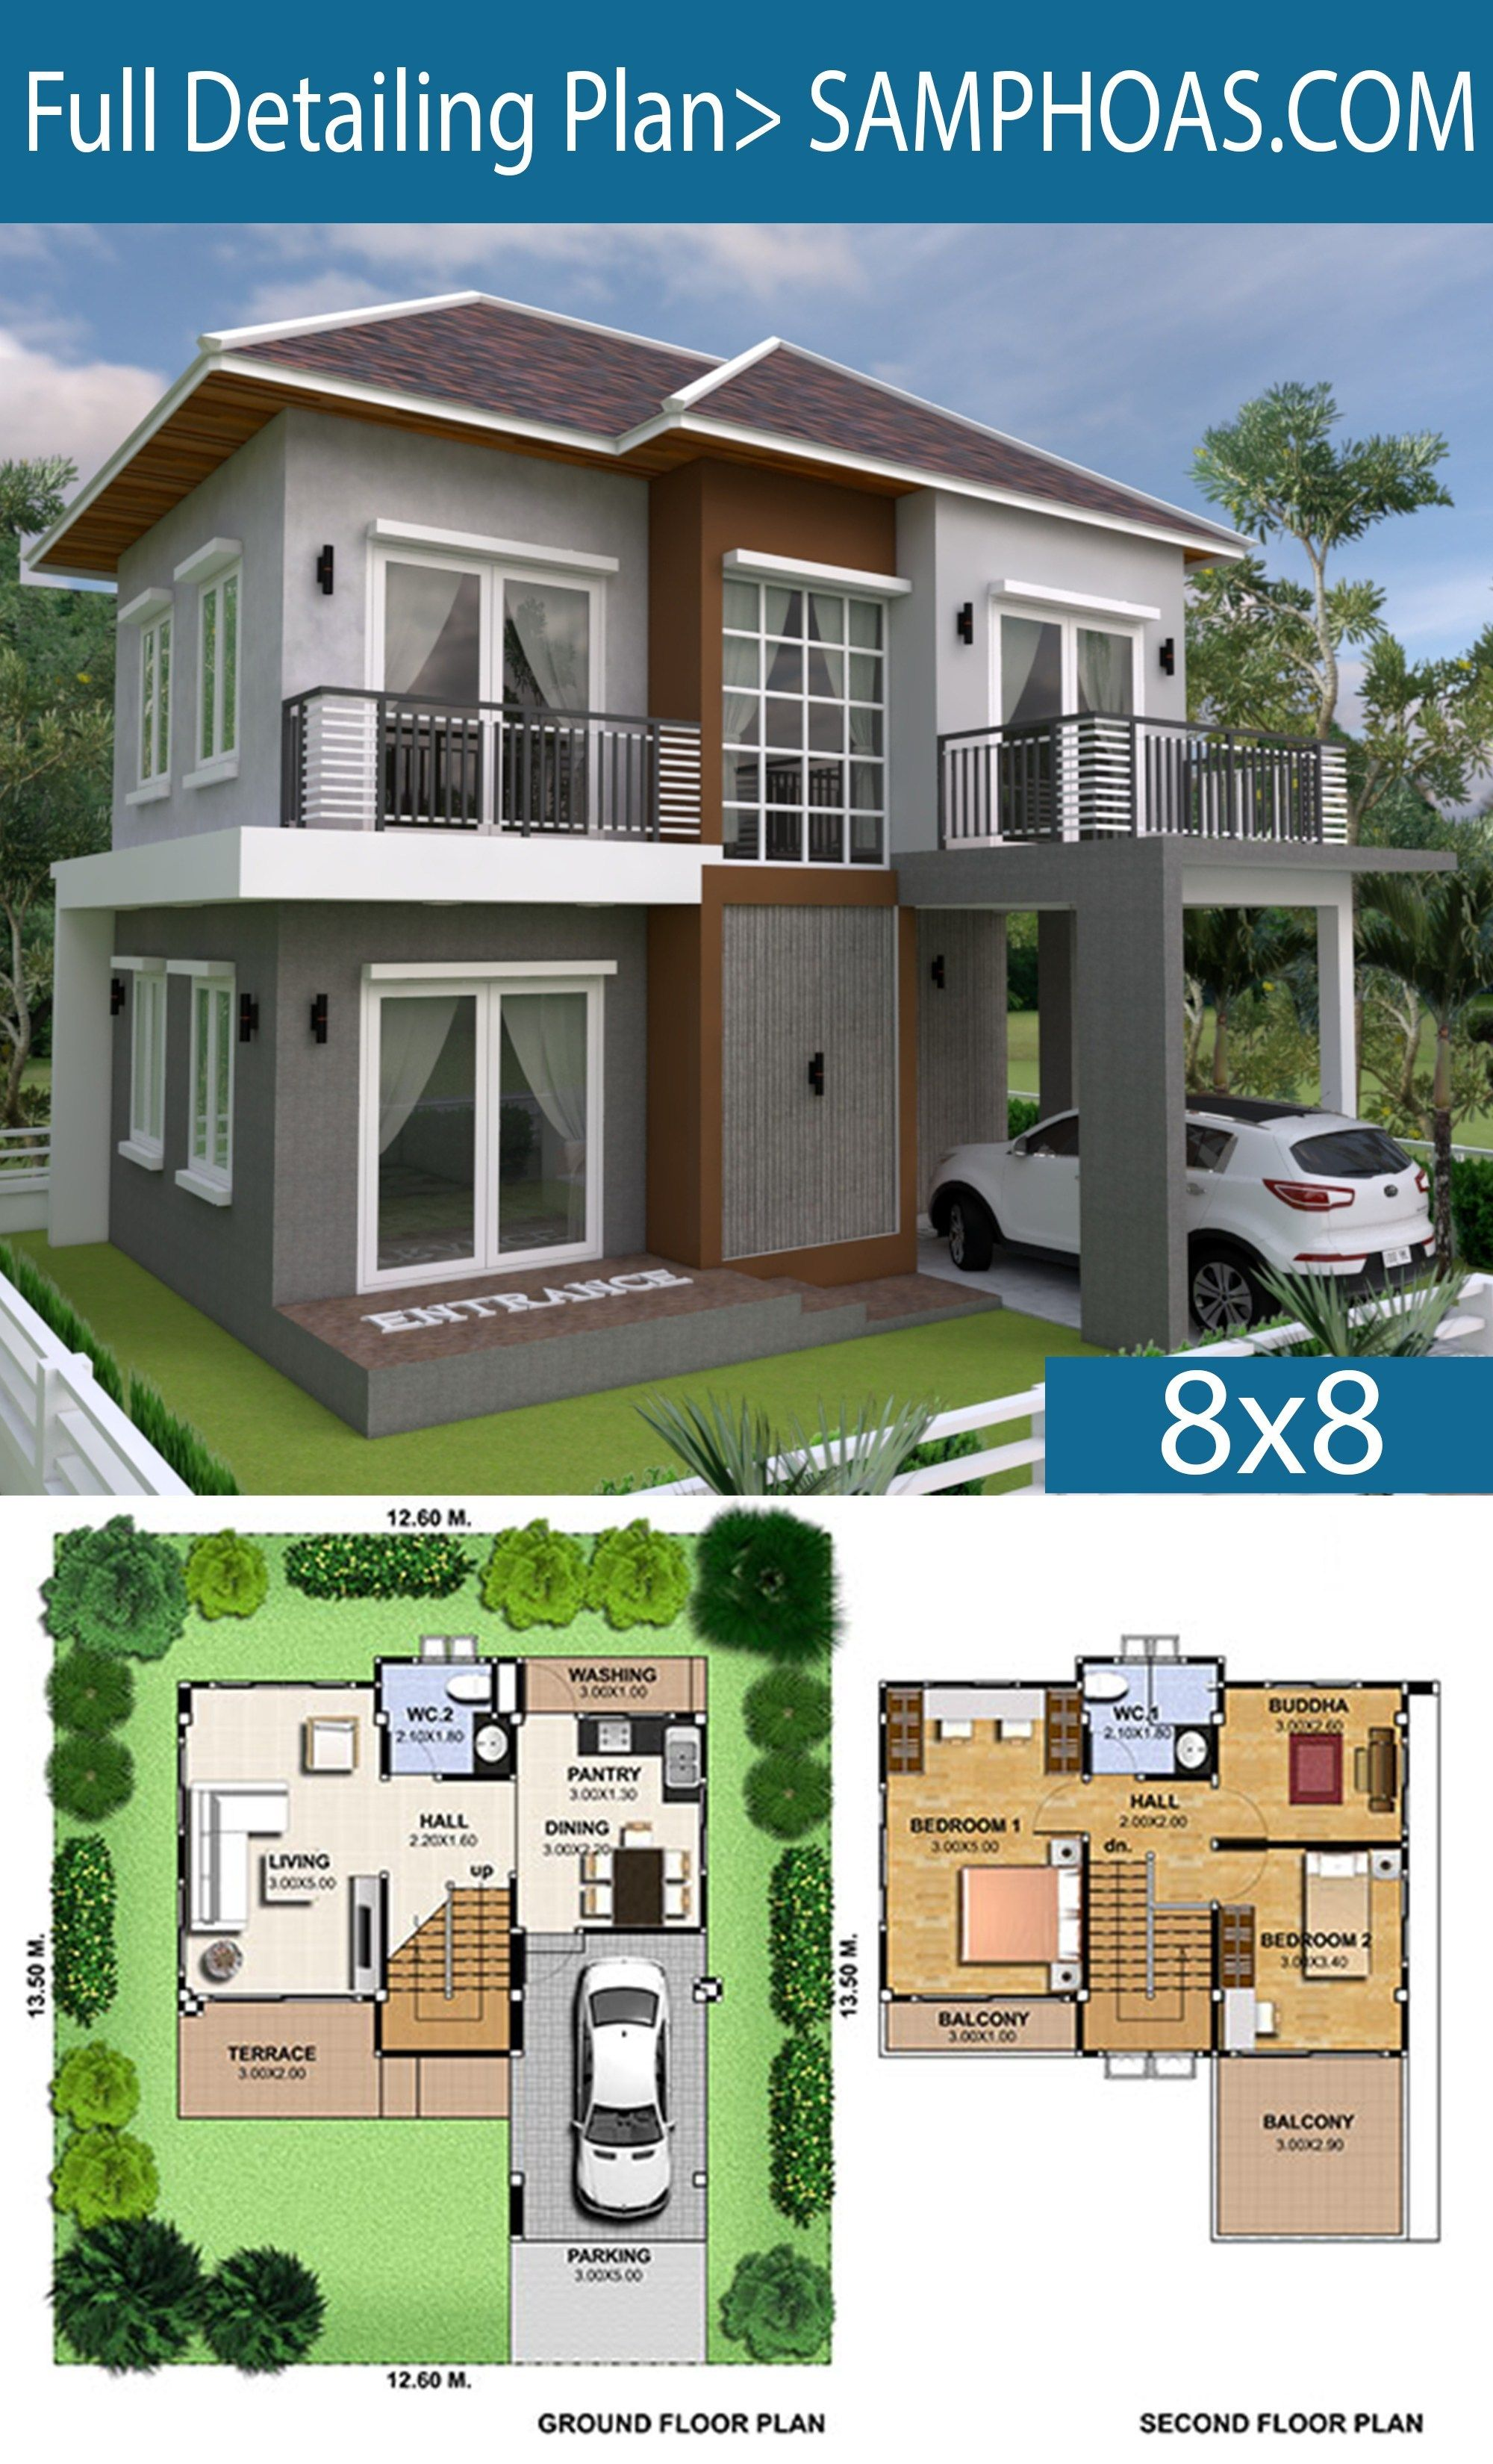 3 Bedrooms Home Plan 8x8m House Plans Home Design Floor Plans Modern House Plans